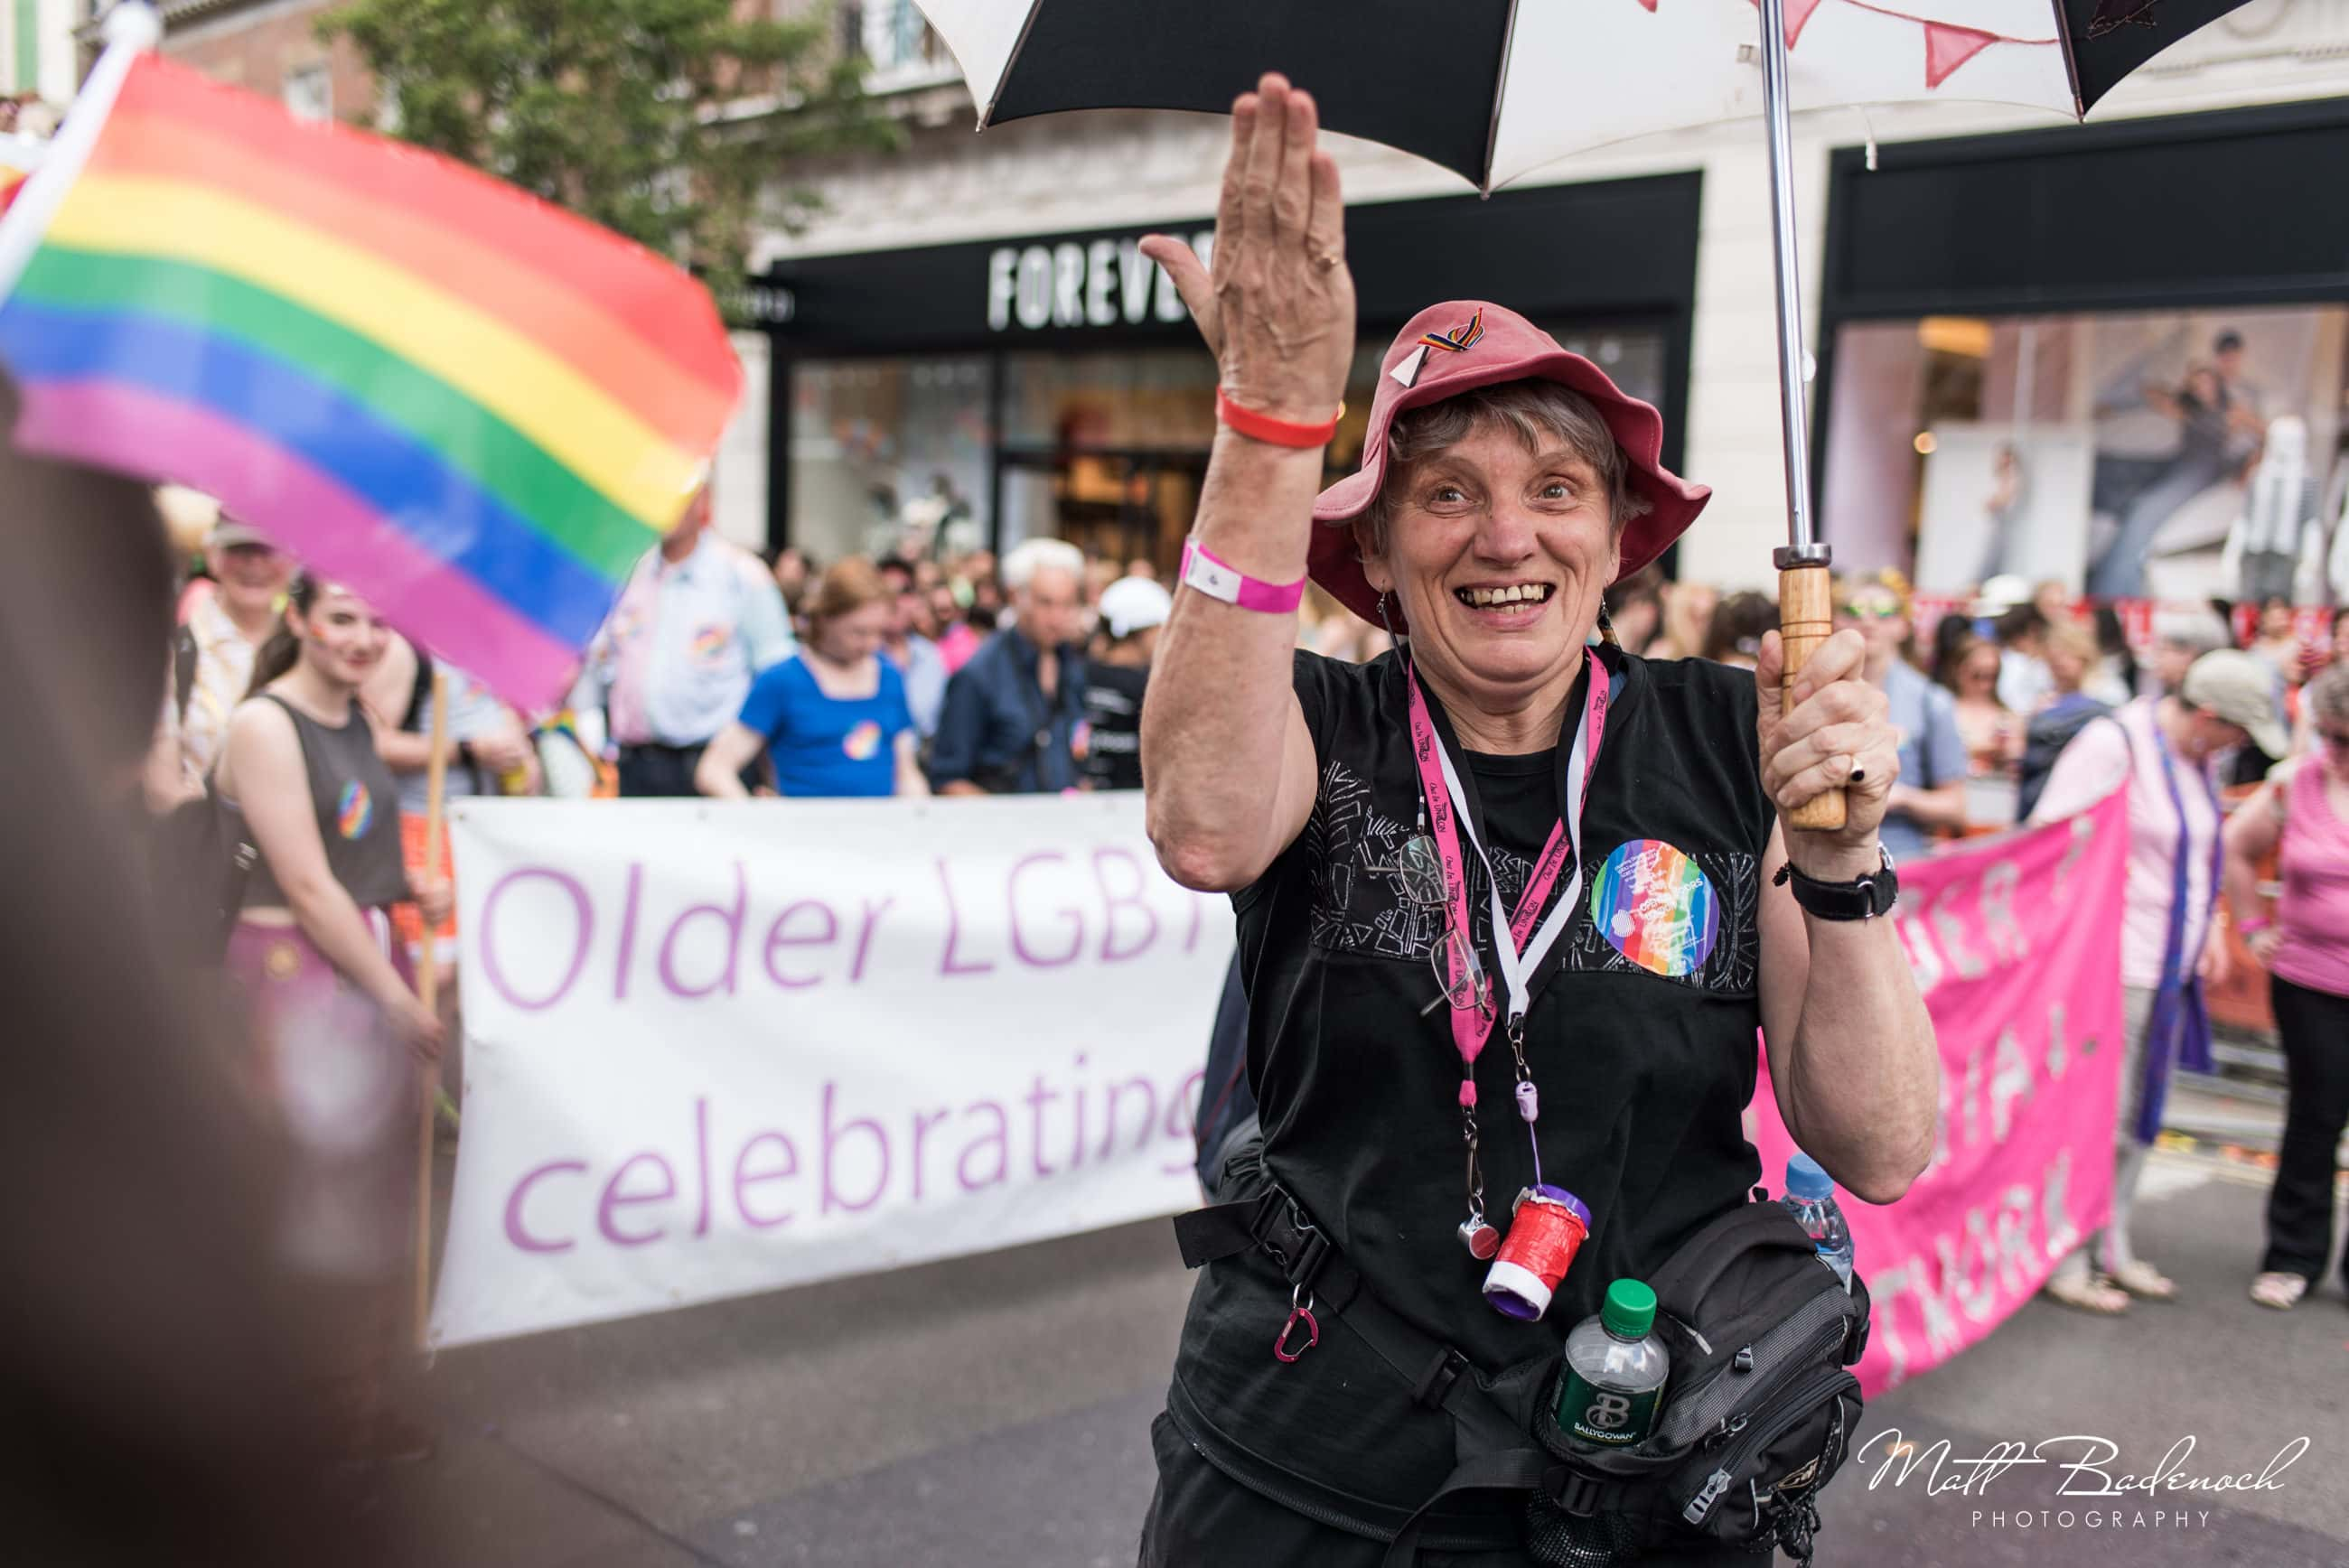 Older LGBT, London Pride Parade 2015 photos